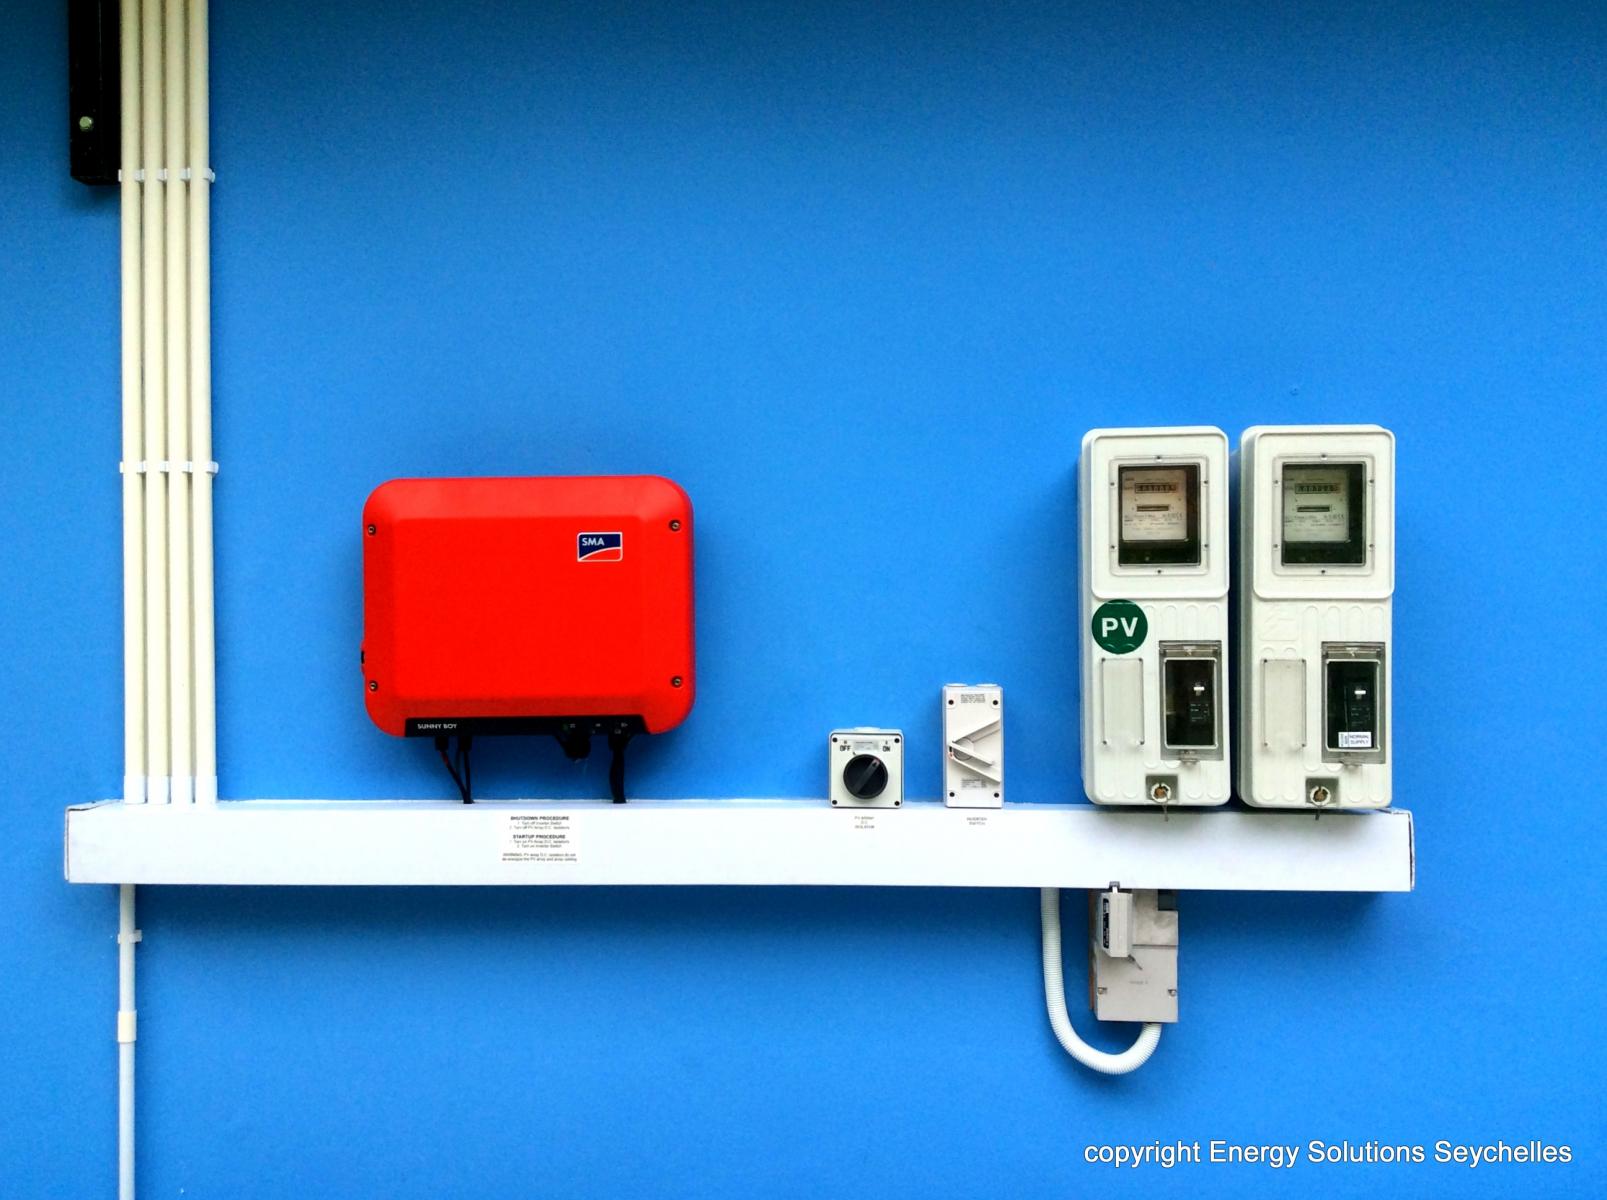 ESS-install-MR-inverter